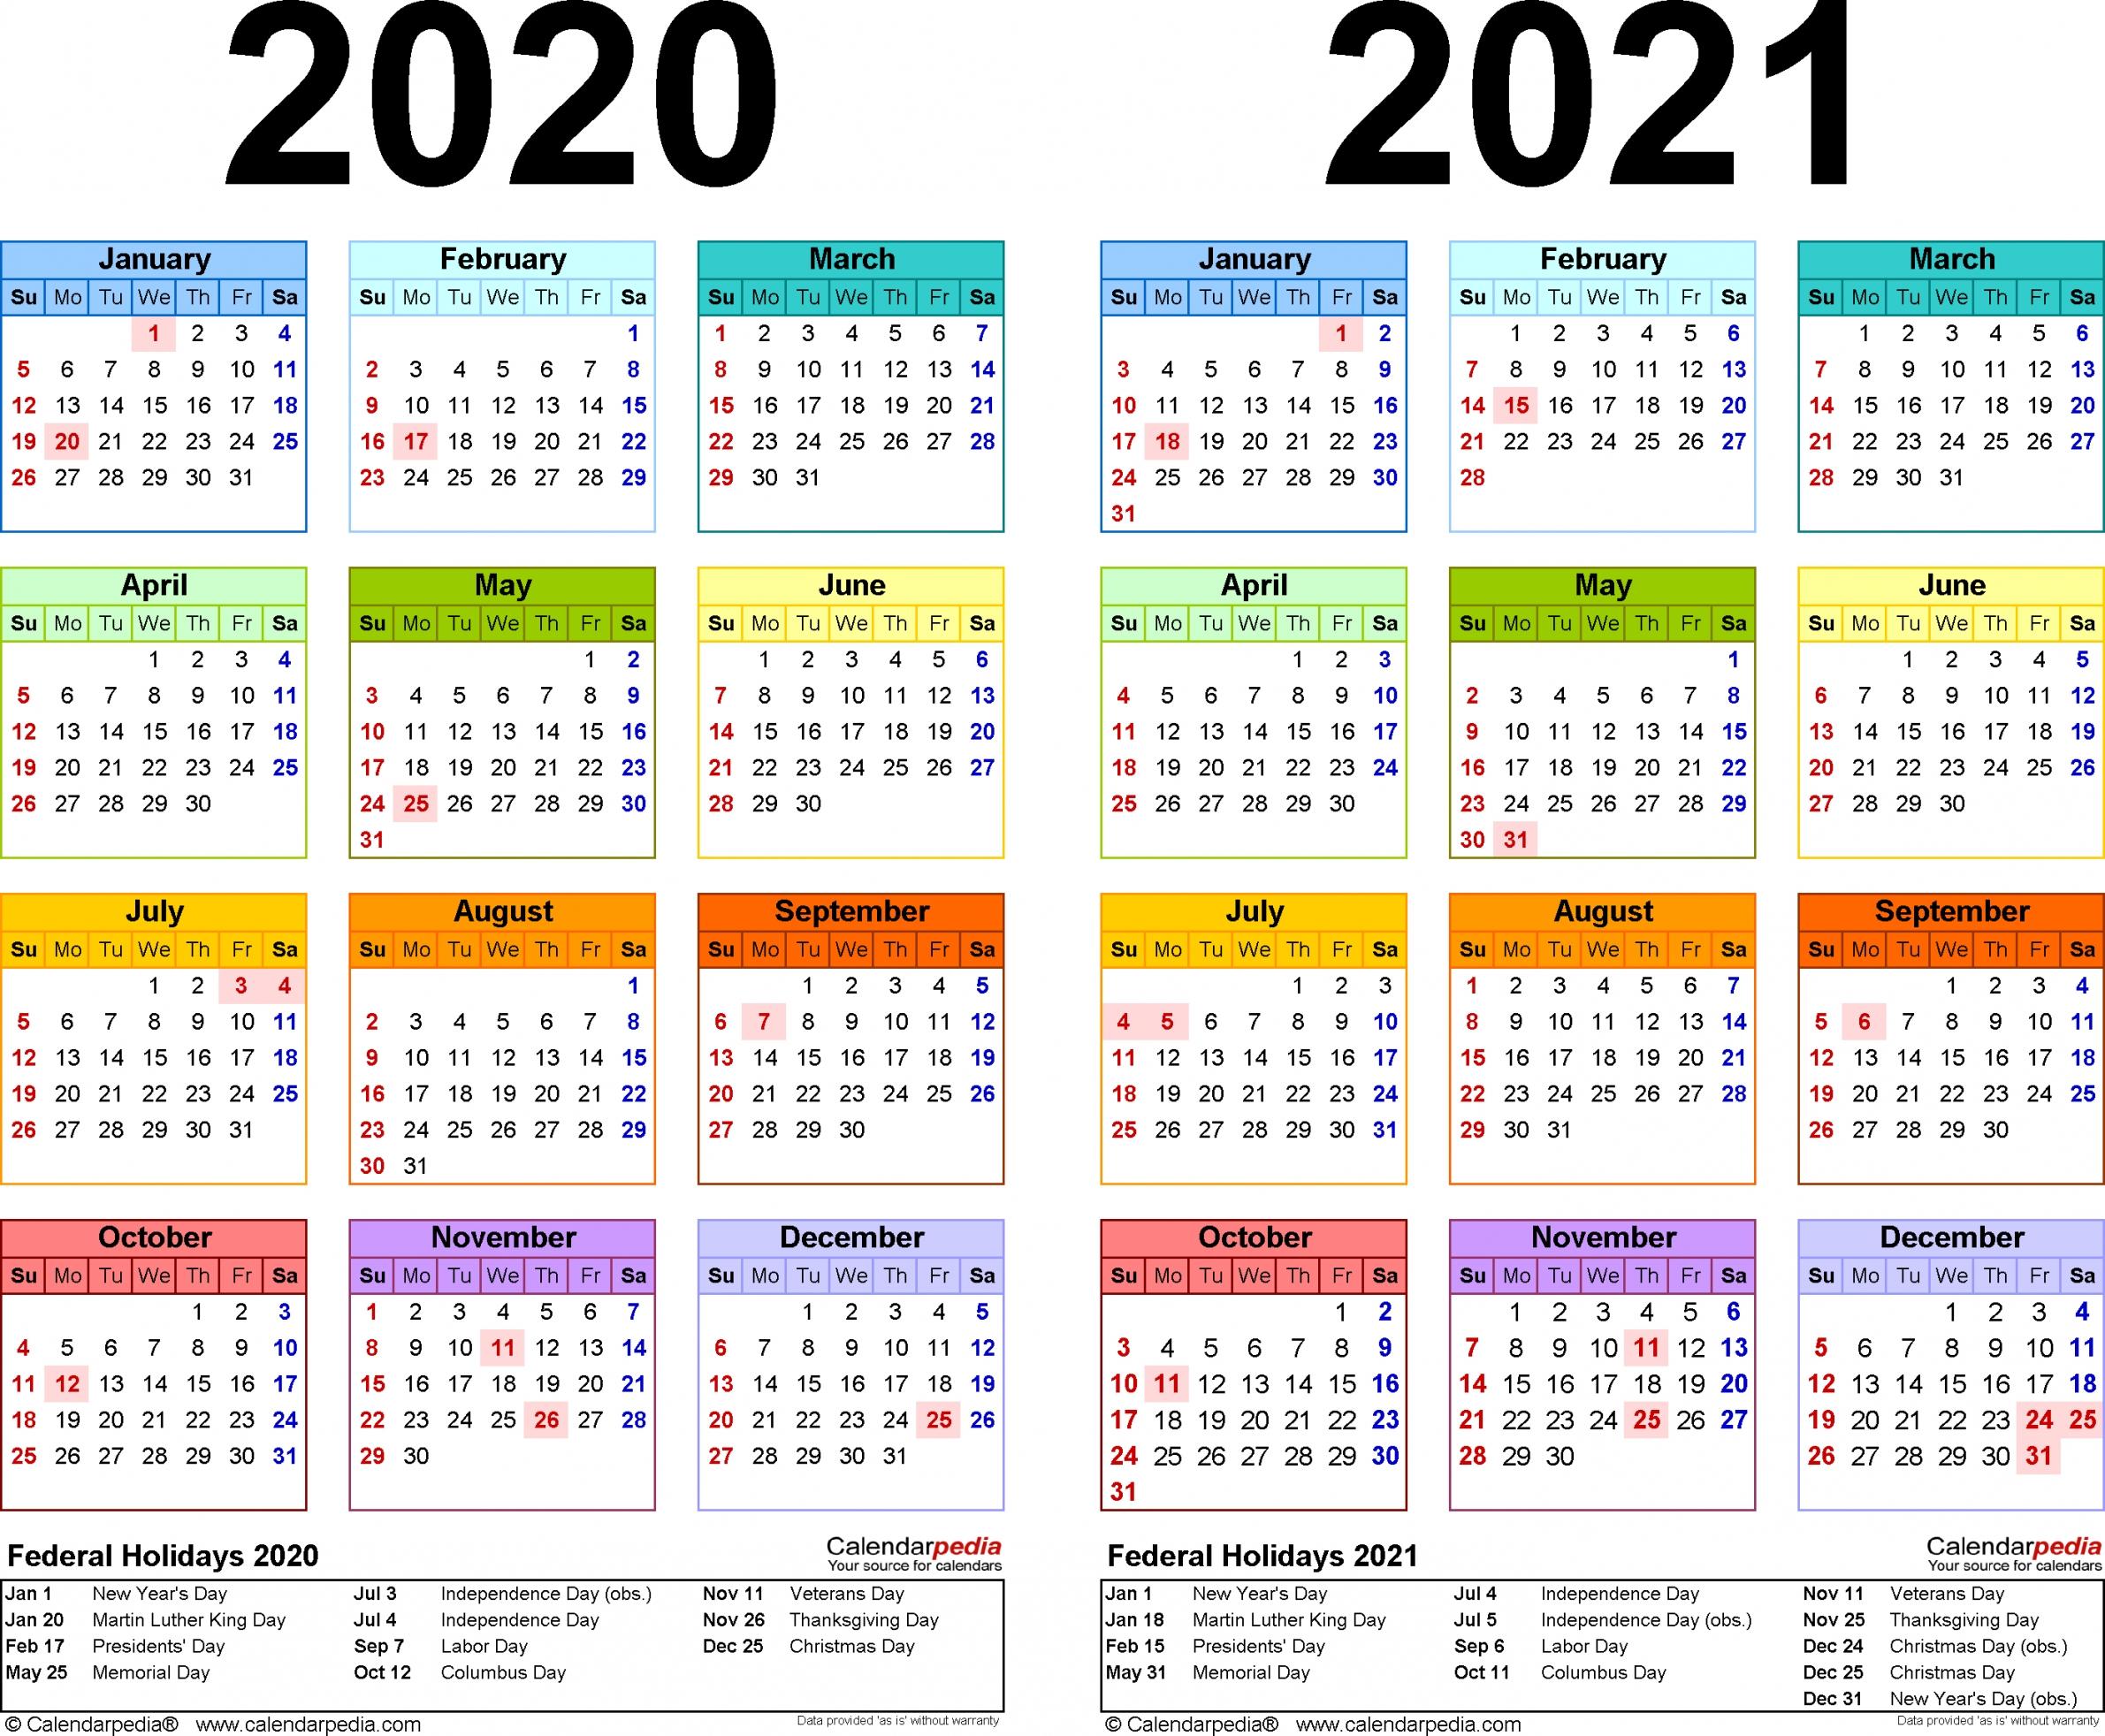 Download 2020 2021 Printable Calendar Free Letter Templates